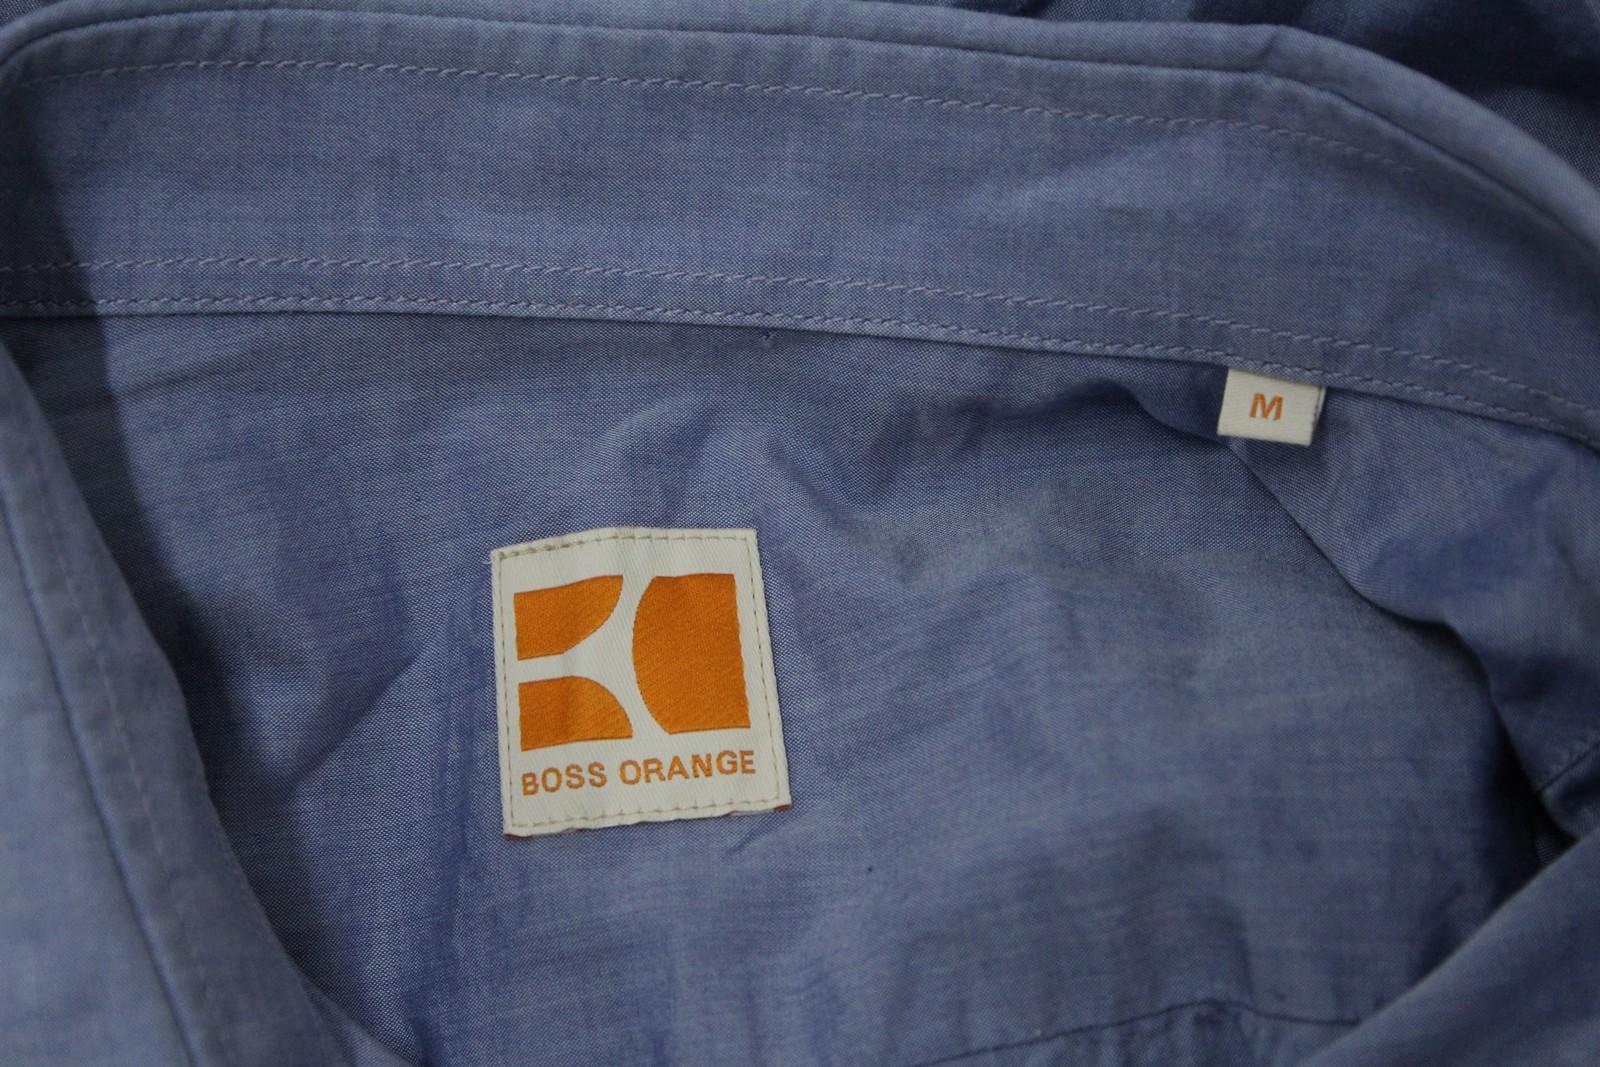 Boss-Orange-men-Azul-Algodon-Manga-Larga-Cuello-Con-Cuello-Informal-Camisa-Talla-M miniatura 8